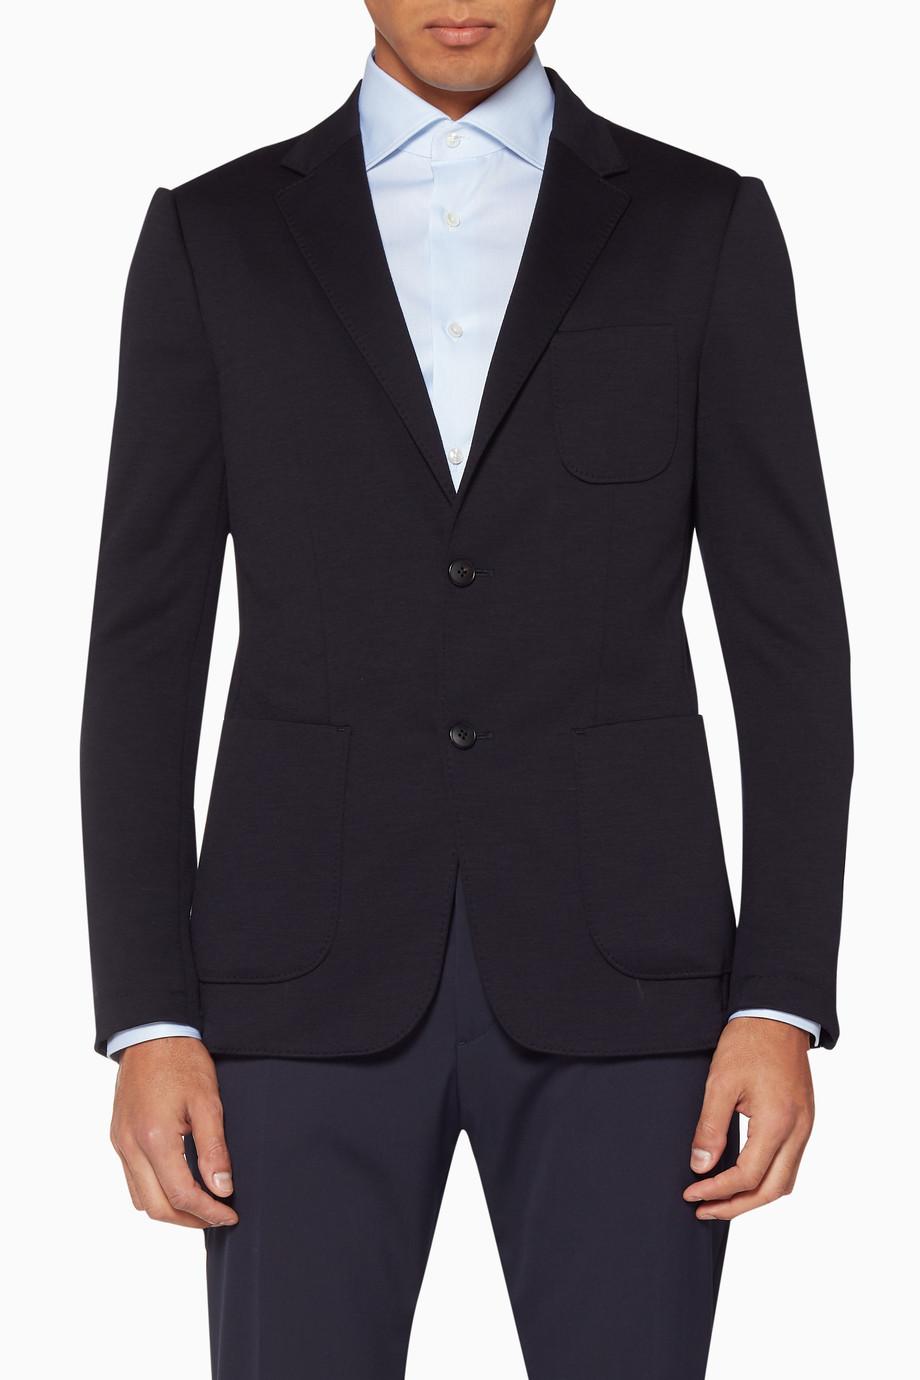 69504b3d42 Shop Z Zegna Blue Navy-Blue Wash & Go TECHMERINO™ Blazer for Men ...